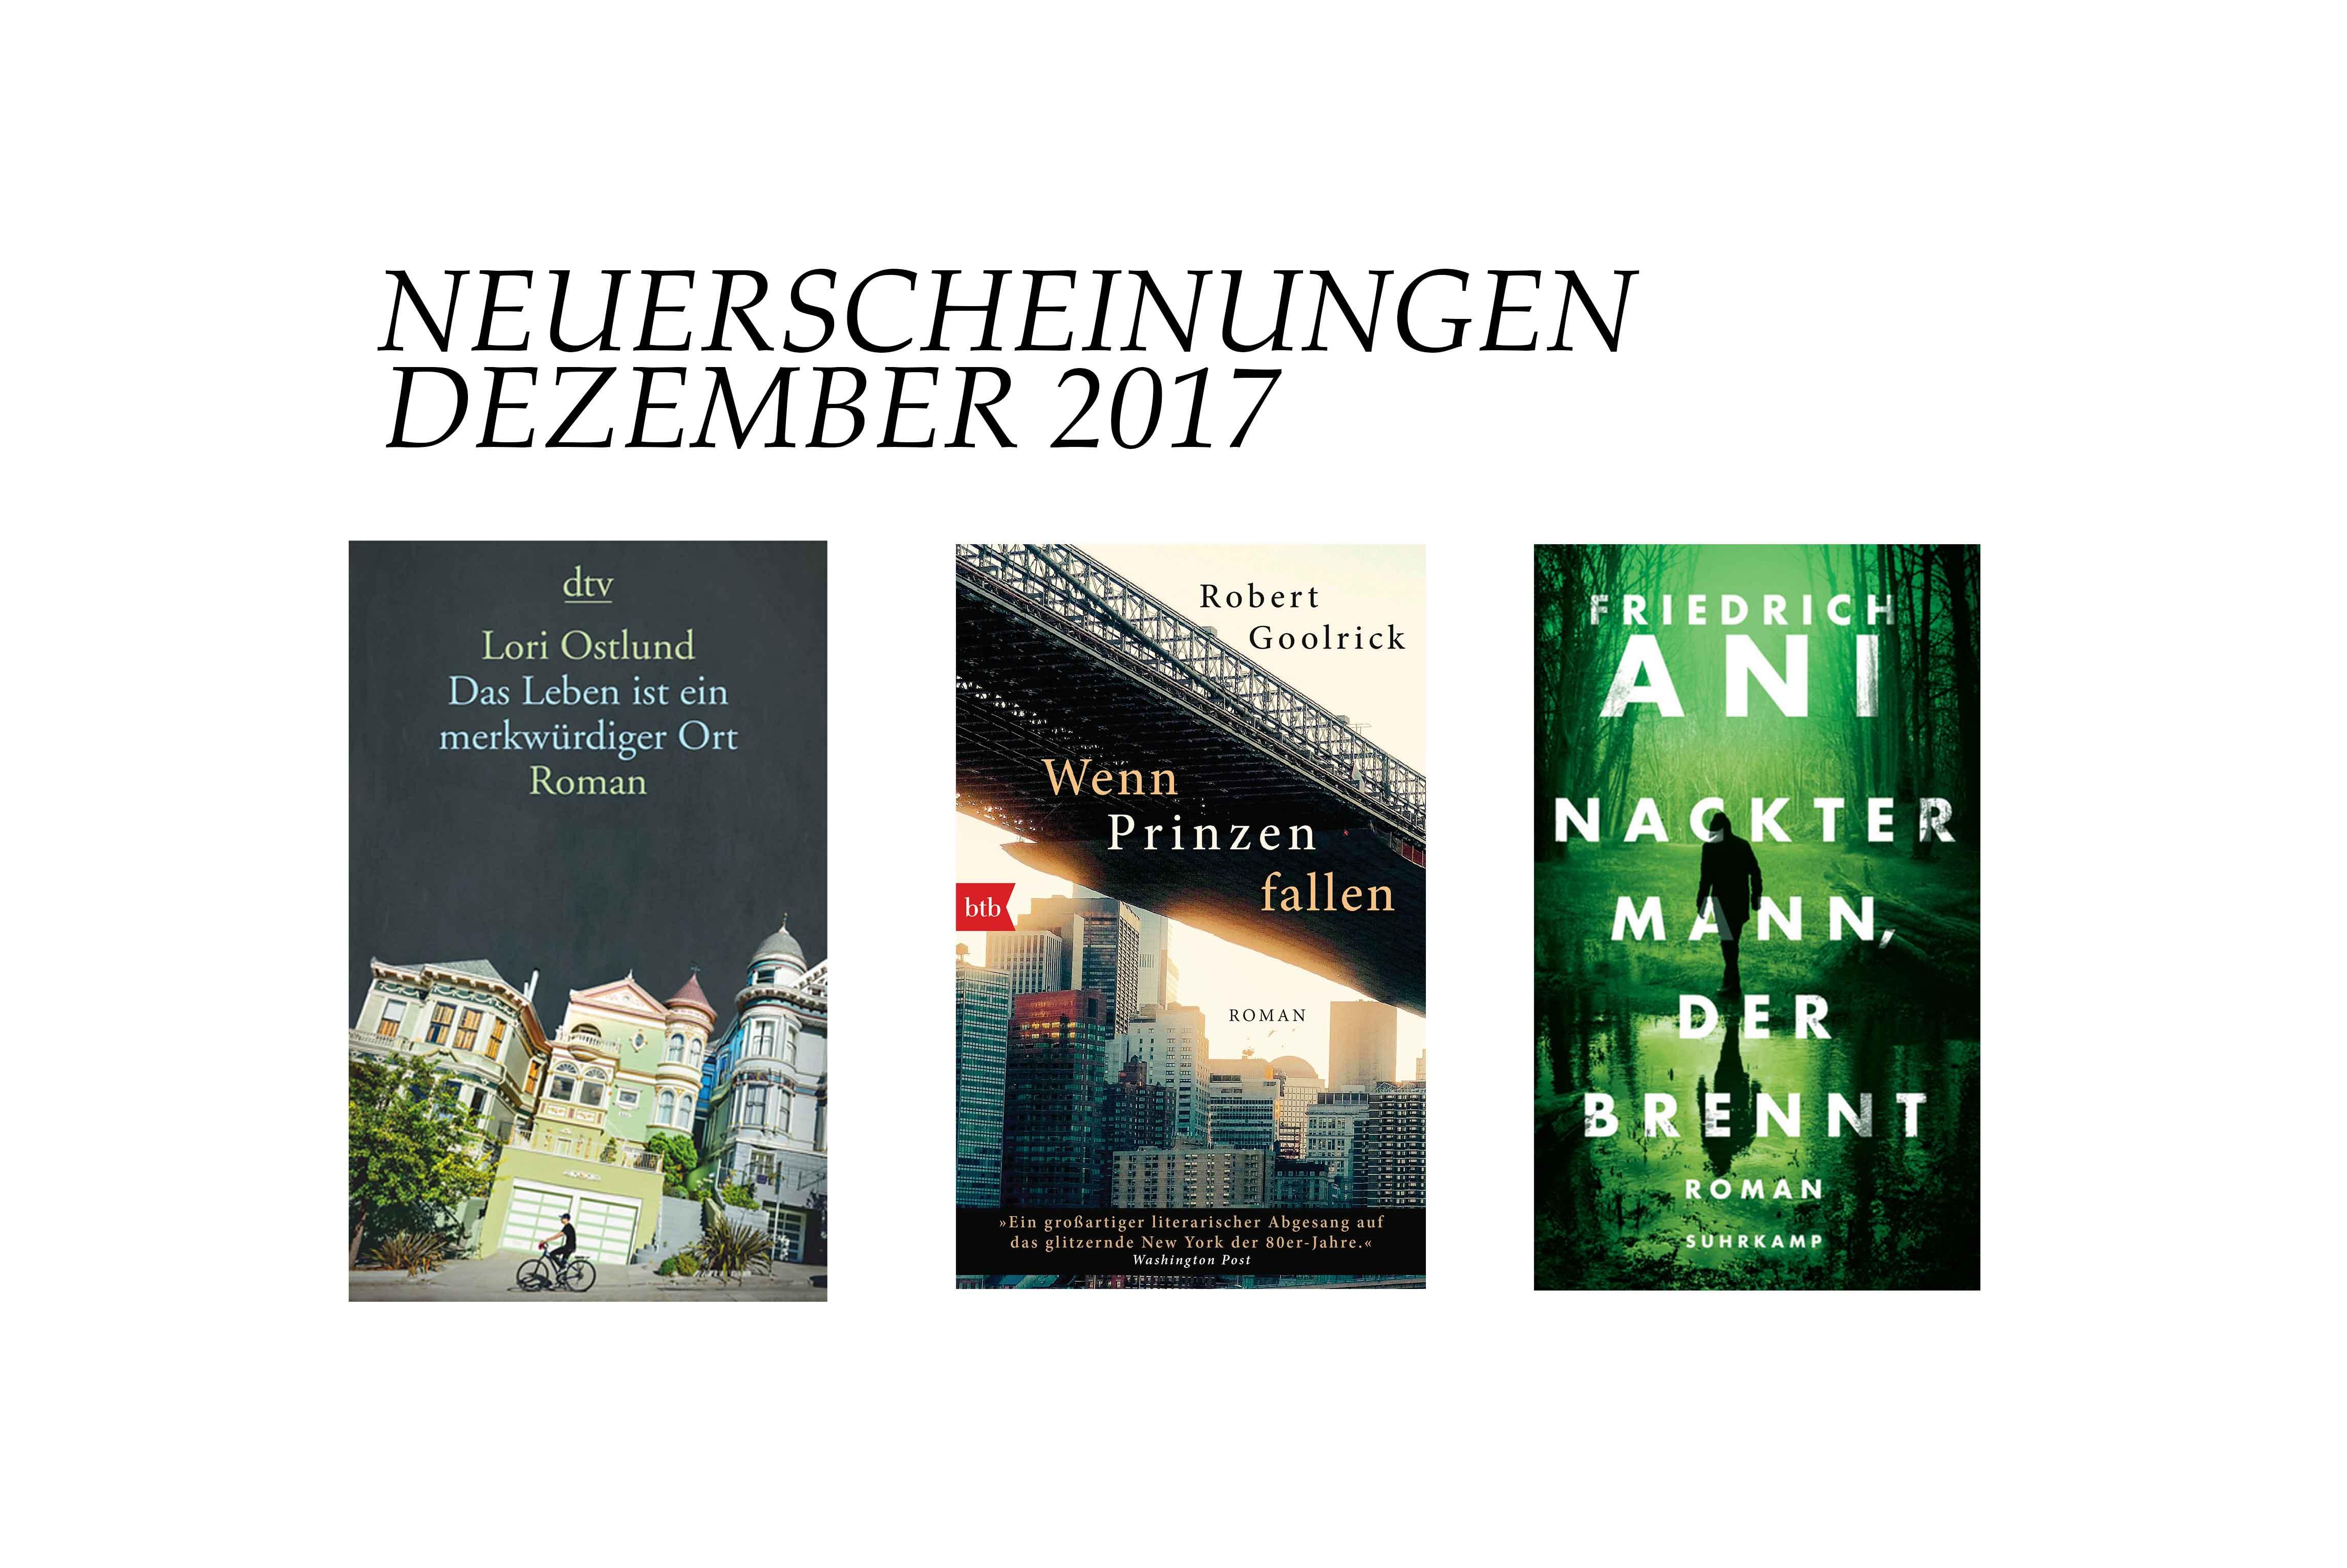 neuerscheinungen-dezember-2017-buch-schonhalbelf-buchblog-friedrich-ani-lori-ostlund-robert-goolrick